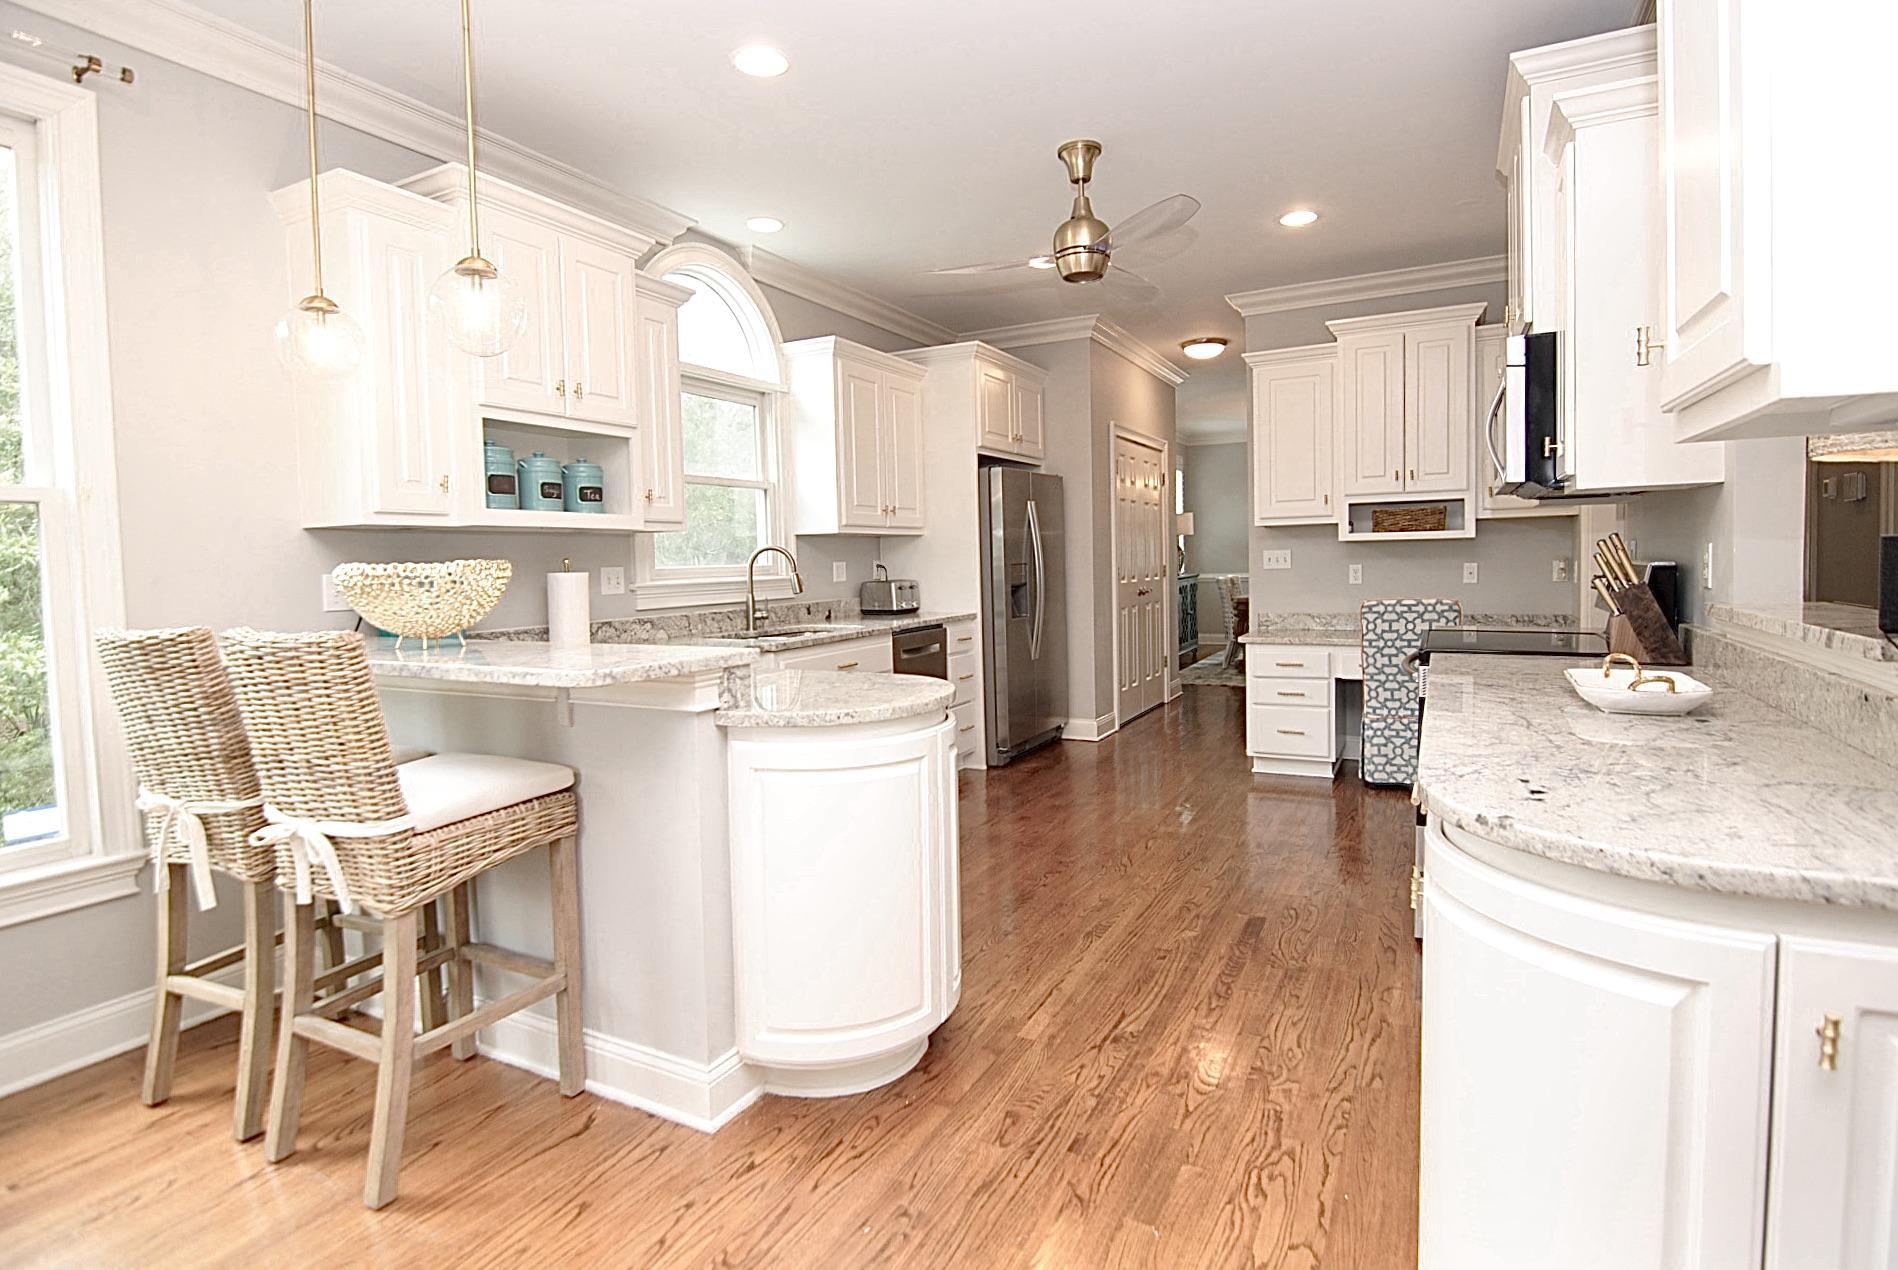 Hobcaw Creek Plantation Homes For Sale - 1513 Strathmore, Mount Pleasant, SC - 20